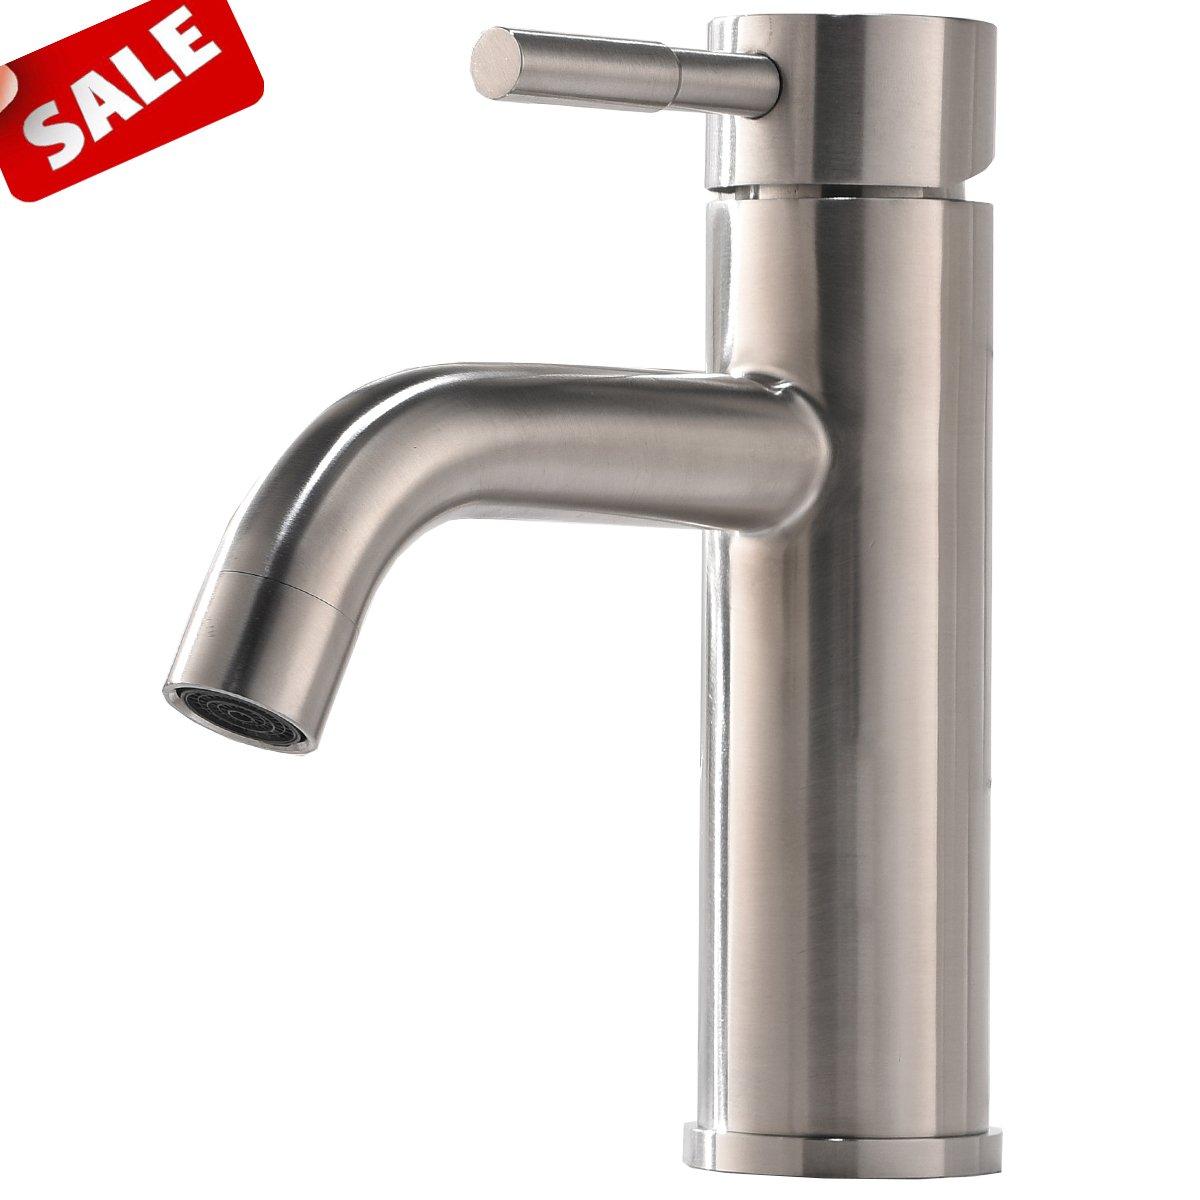 Shaco Commercial Stainless Steel Vanity Single Handle Bathroom Faucet ,Brushed Nickel Bathroom Sink Faucets